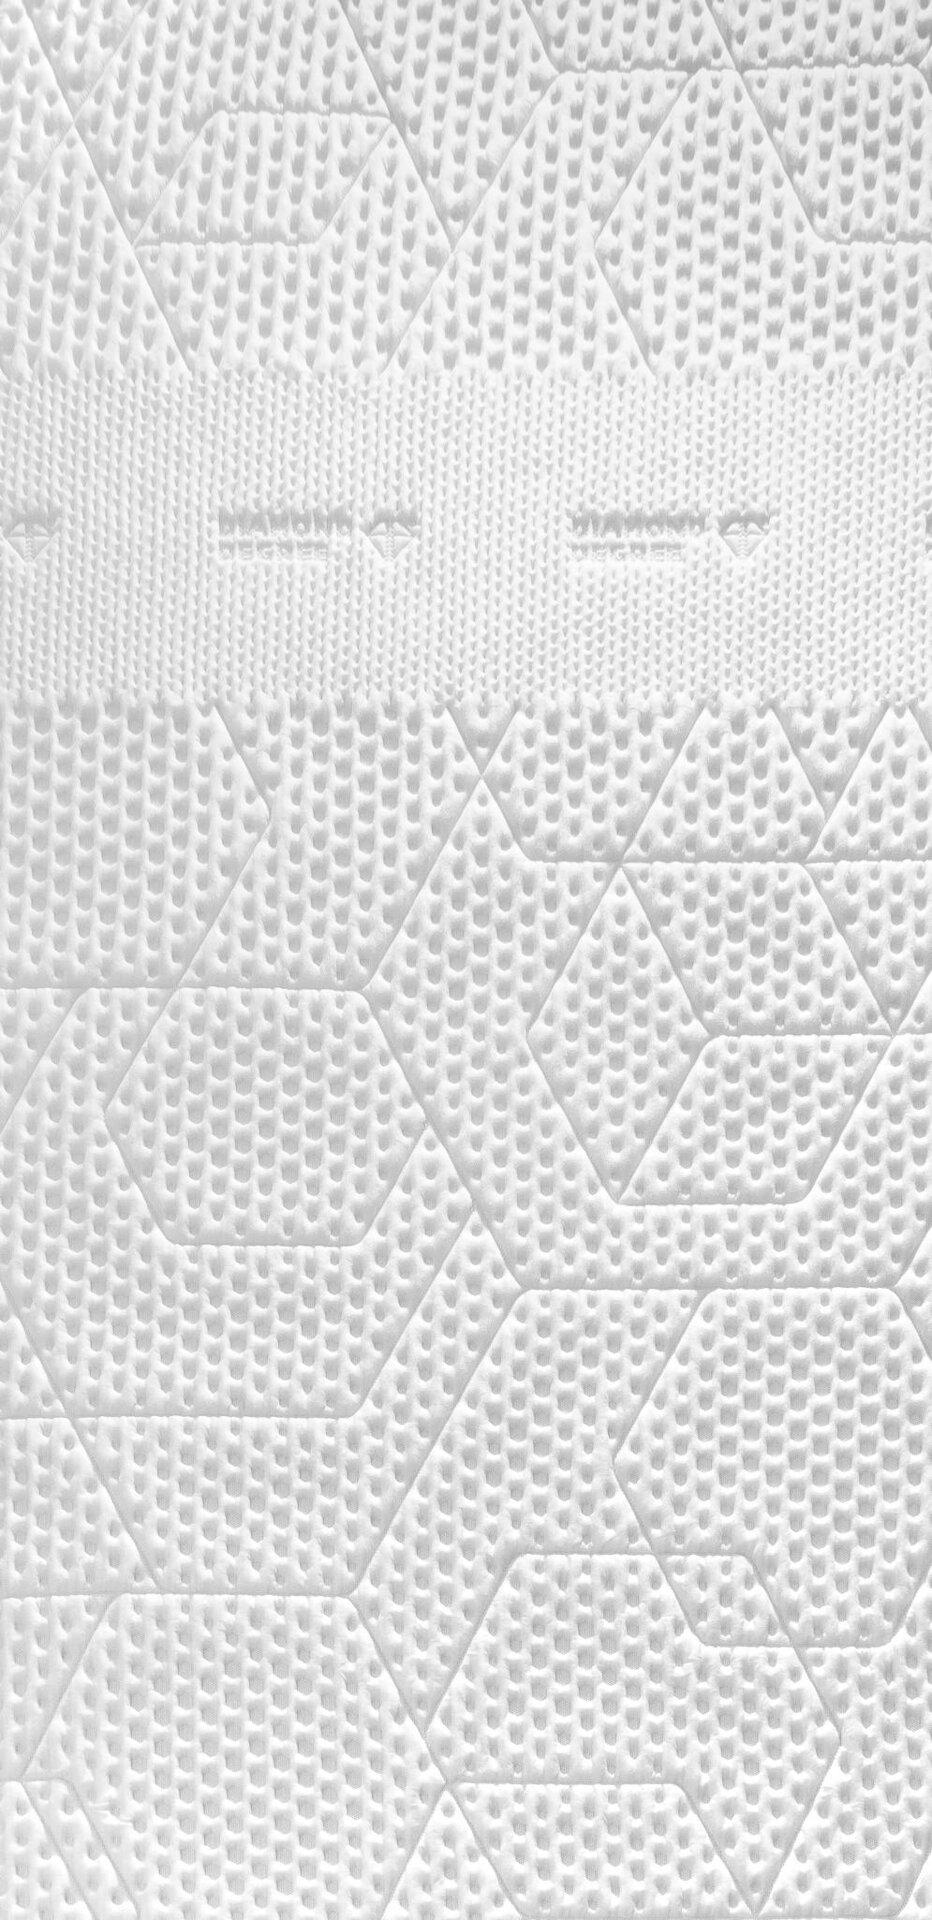 Topper Diamond Degree Topper Dunlopillo Textil weiß 180 x 8 x 200 cm